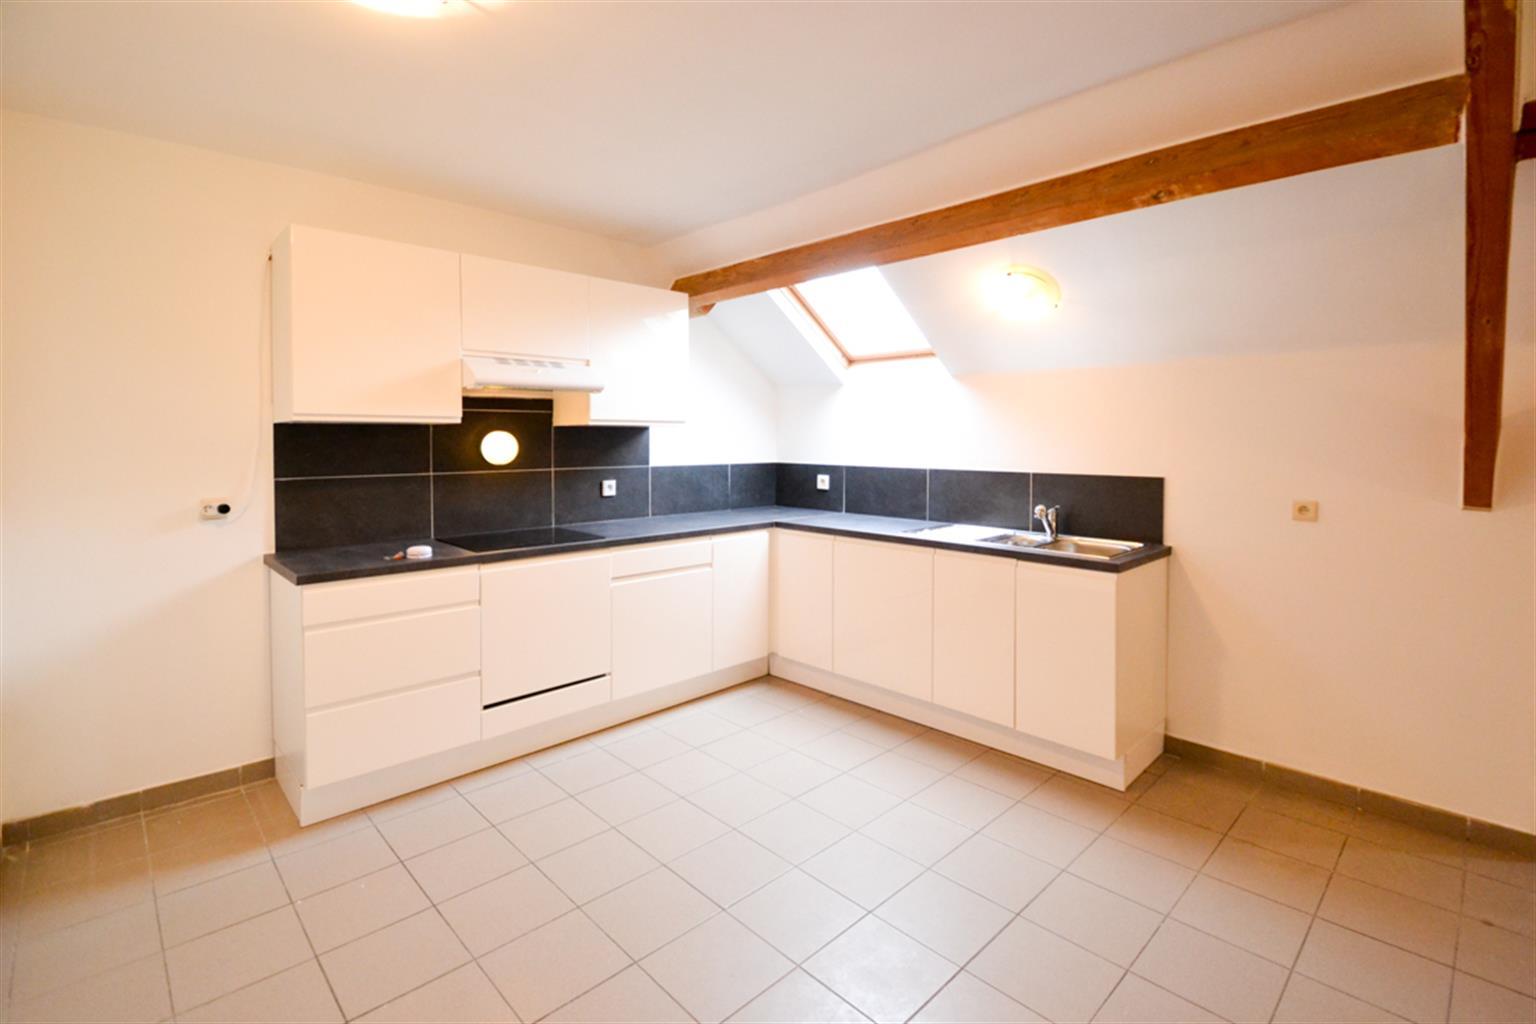 Appartement - Leval-Trahegnies - #3866773-1